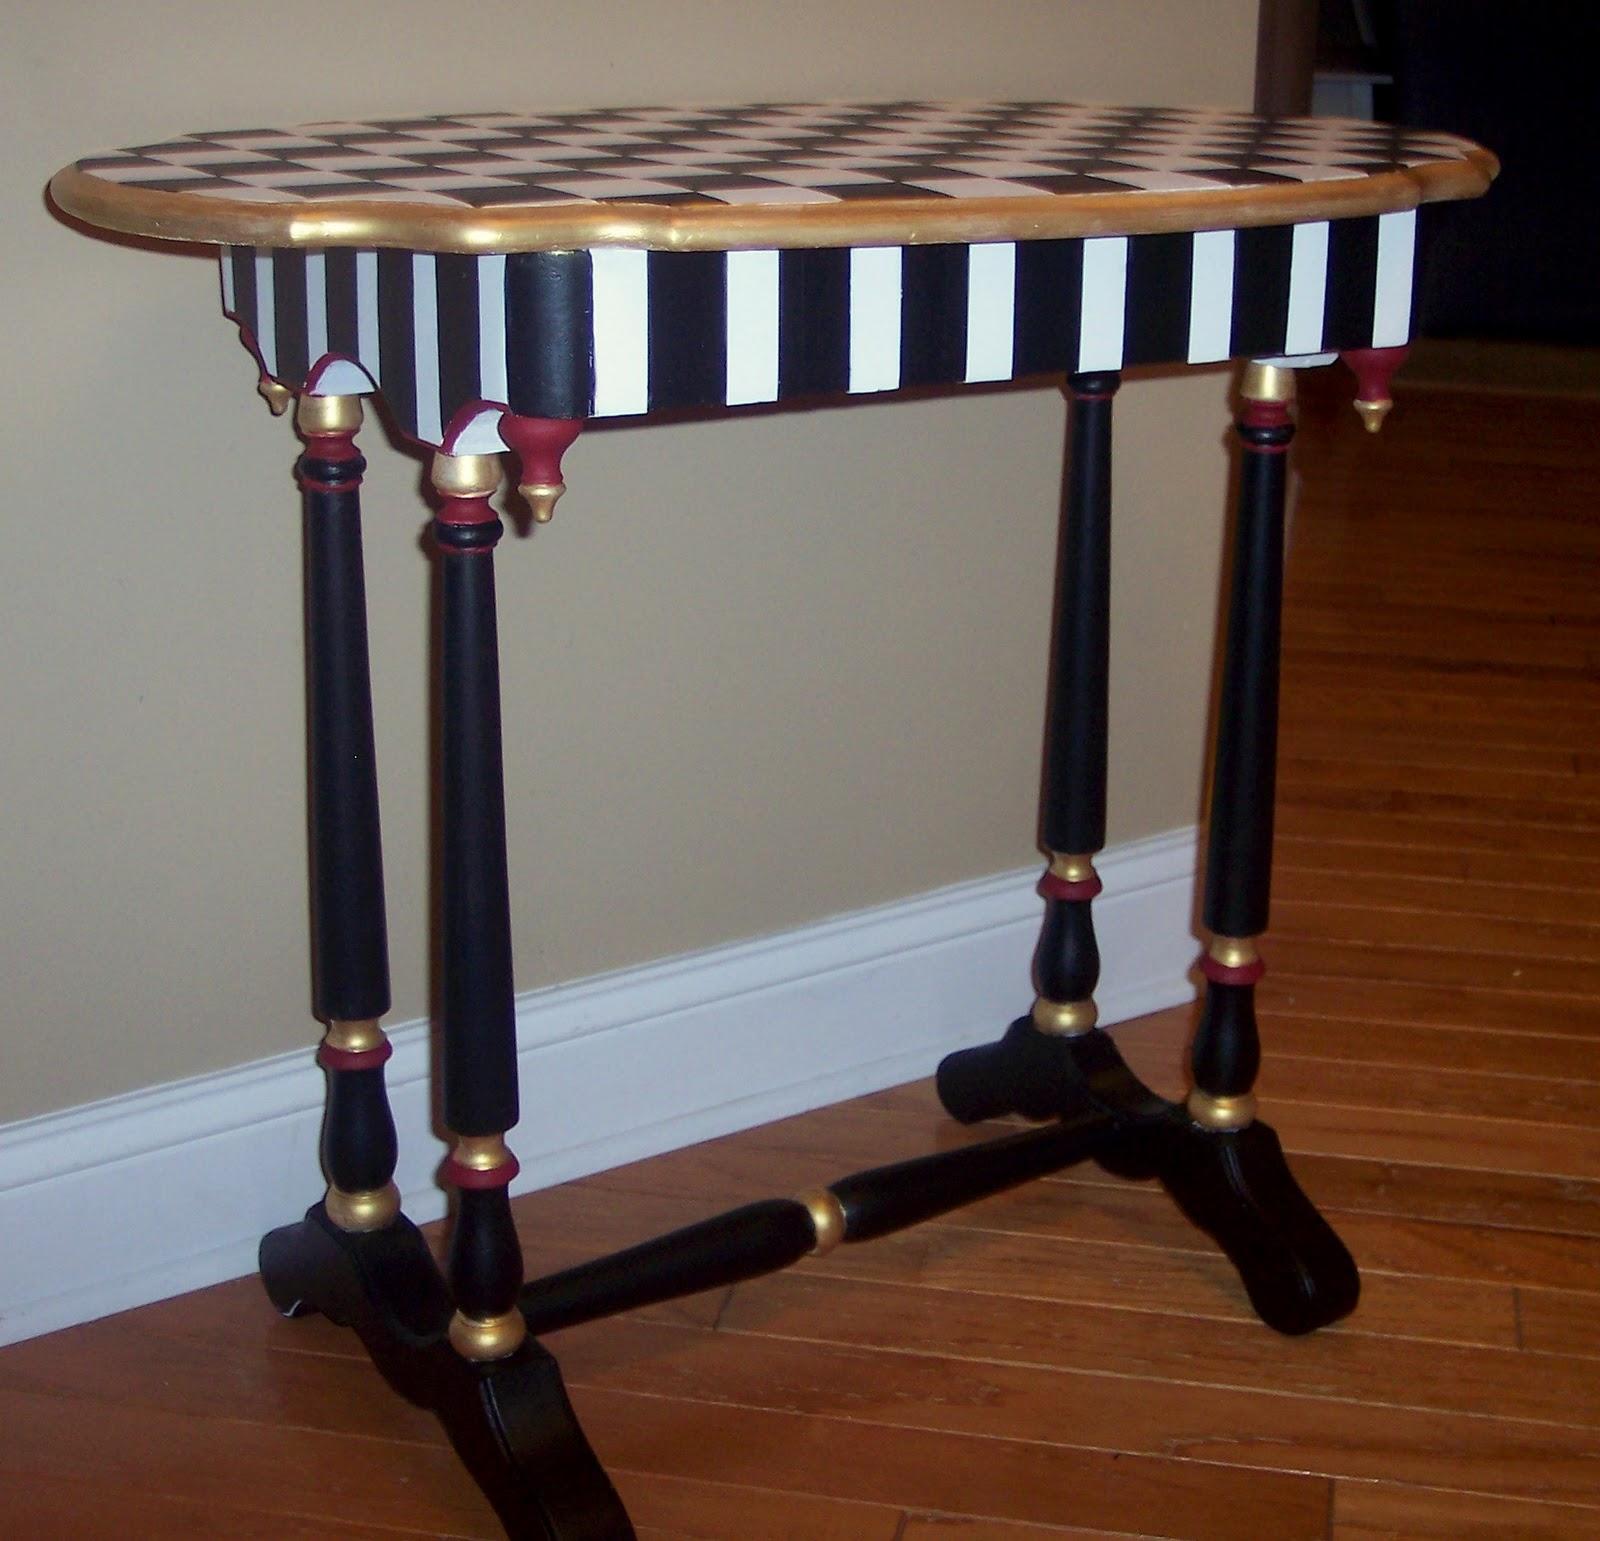 Uniquely Chic Furniture Mackenzie Childs Style